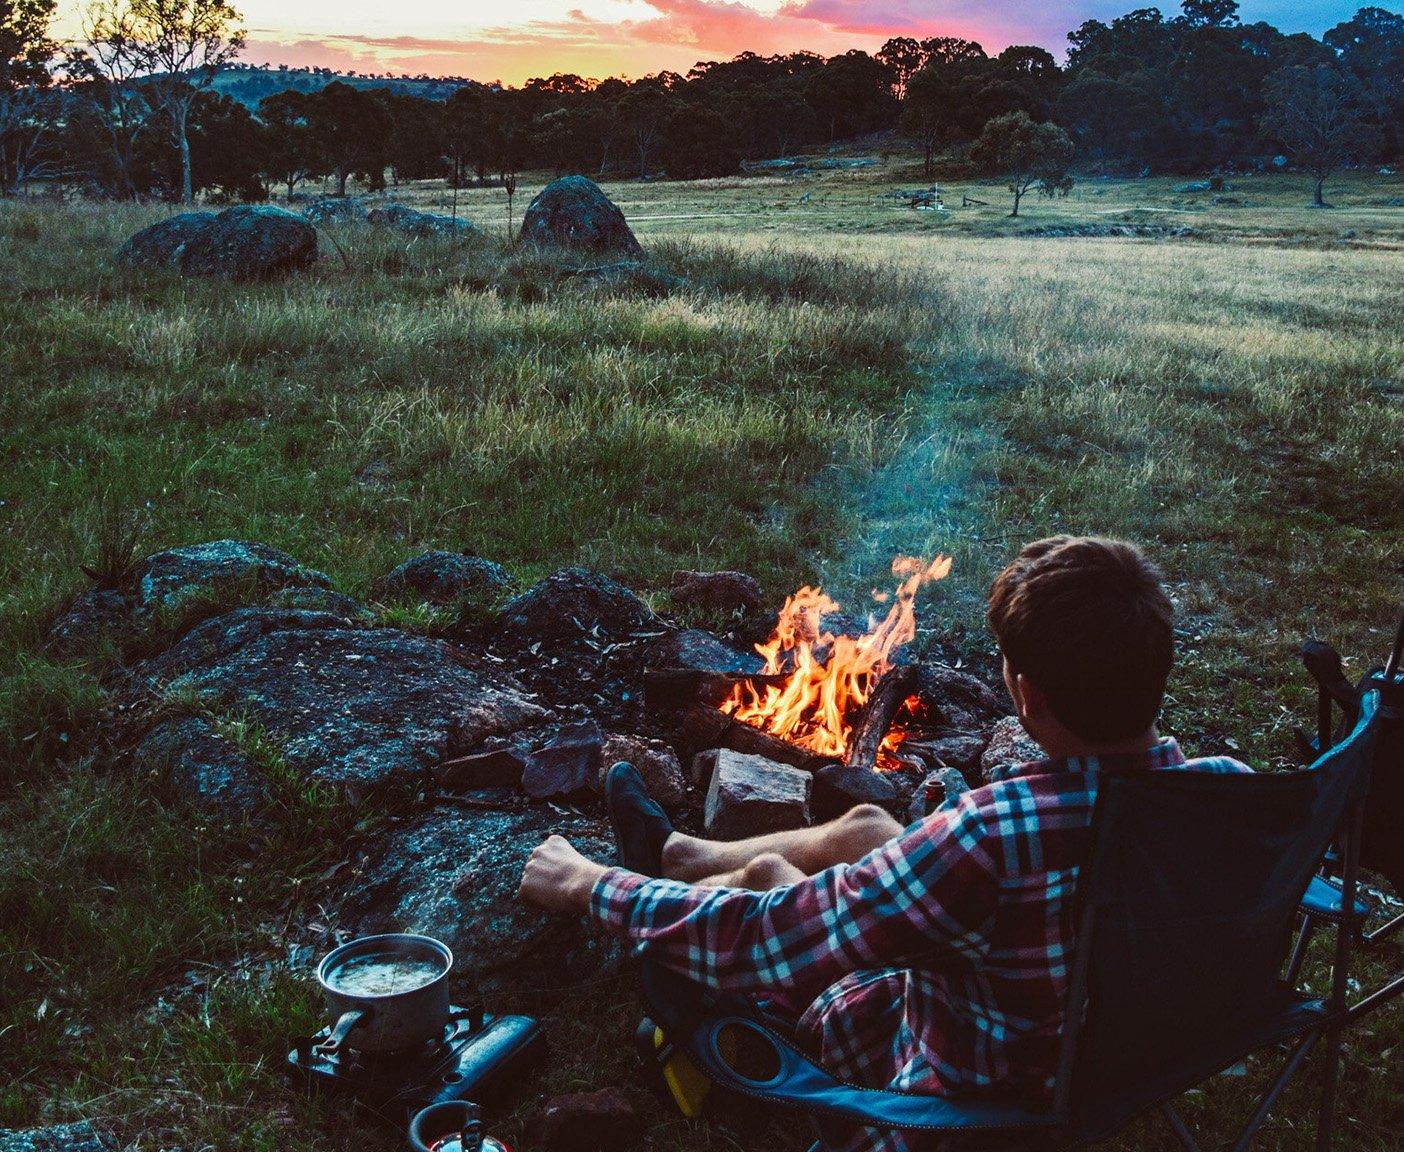 Wohnmobil-Grundausstattung fuer Einsteiger Campingstuhl Lagerfeuer